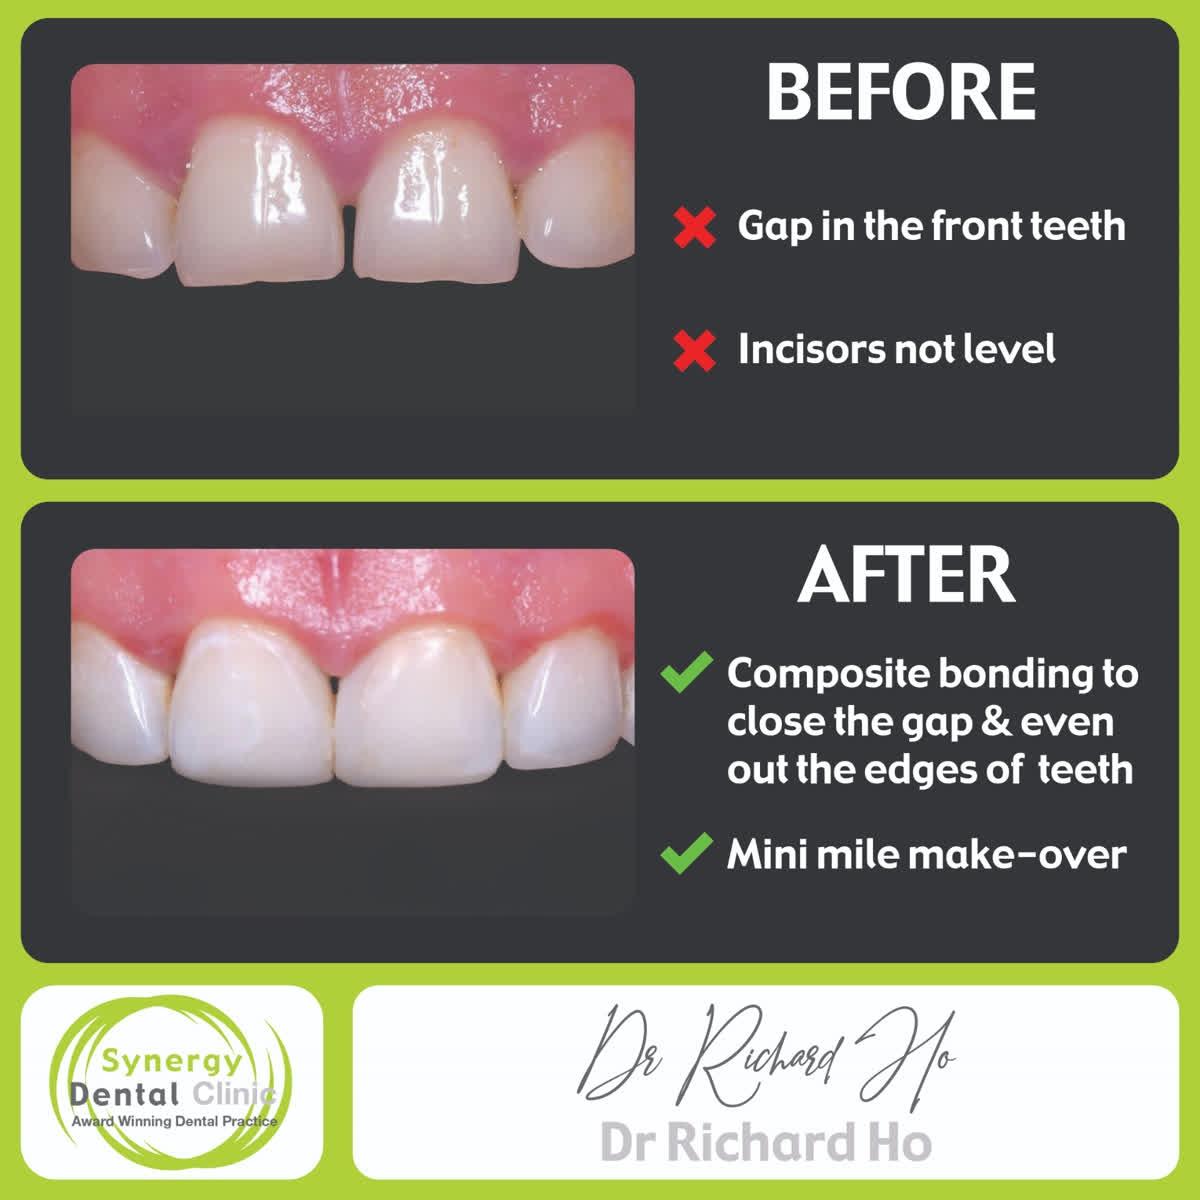 🌍 https://t.co/5pYuhYL7Ju  📱 Instagram - https://t.co/G2pNfgZG5S  🐦Twitter - SynergyDentist  🎥 Youtube - Synergy Dental Clinics . . . . #toothwhitening #teethwhitening #smilemakeover #dentist #transformation #dentalphotography #cosmetics #makeupartist #fff https://t.co/va2JQbgVjd